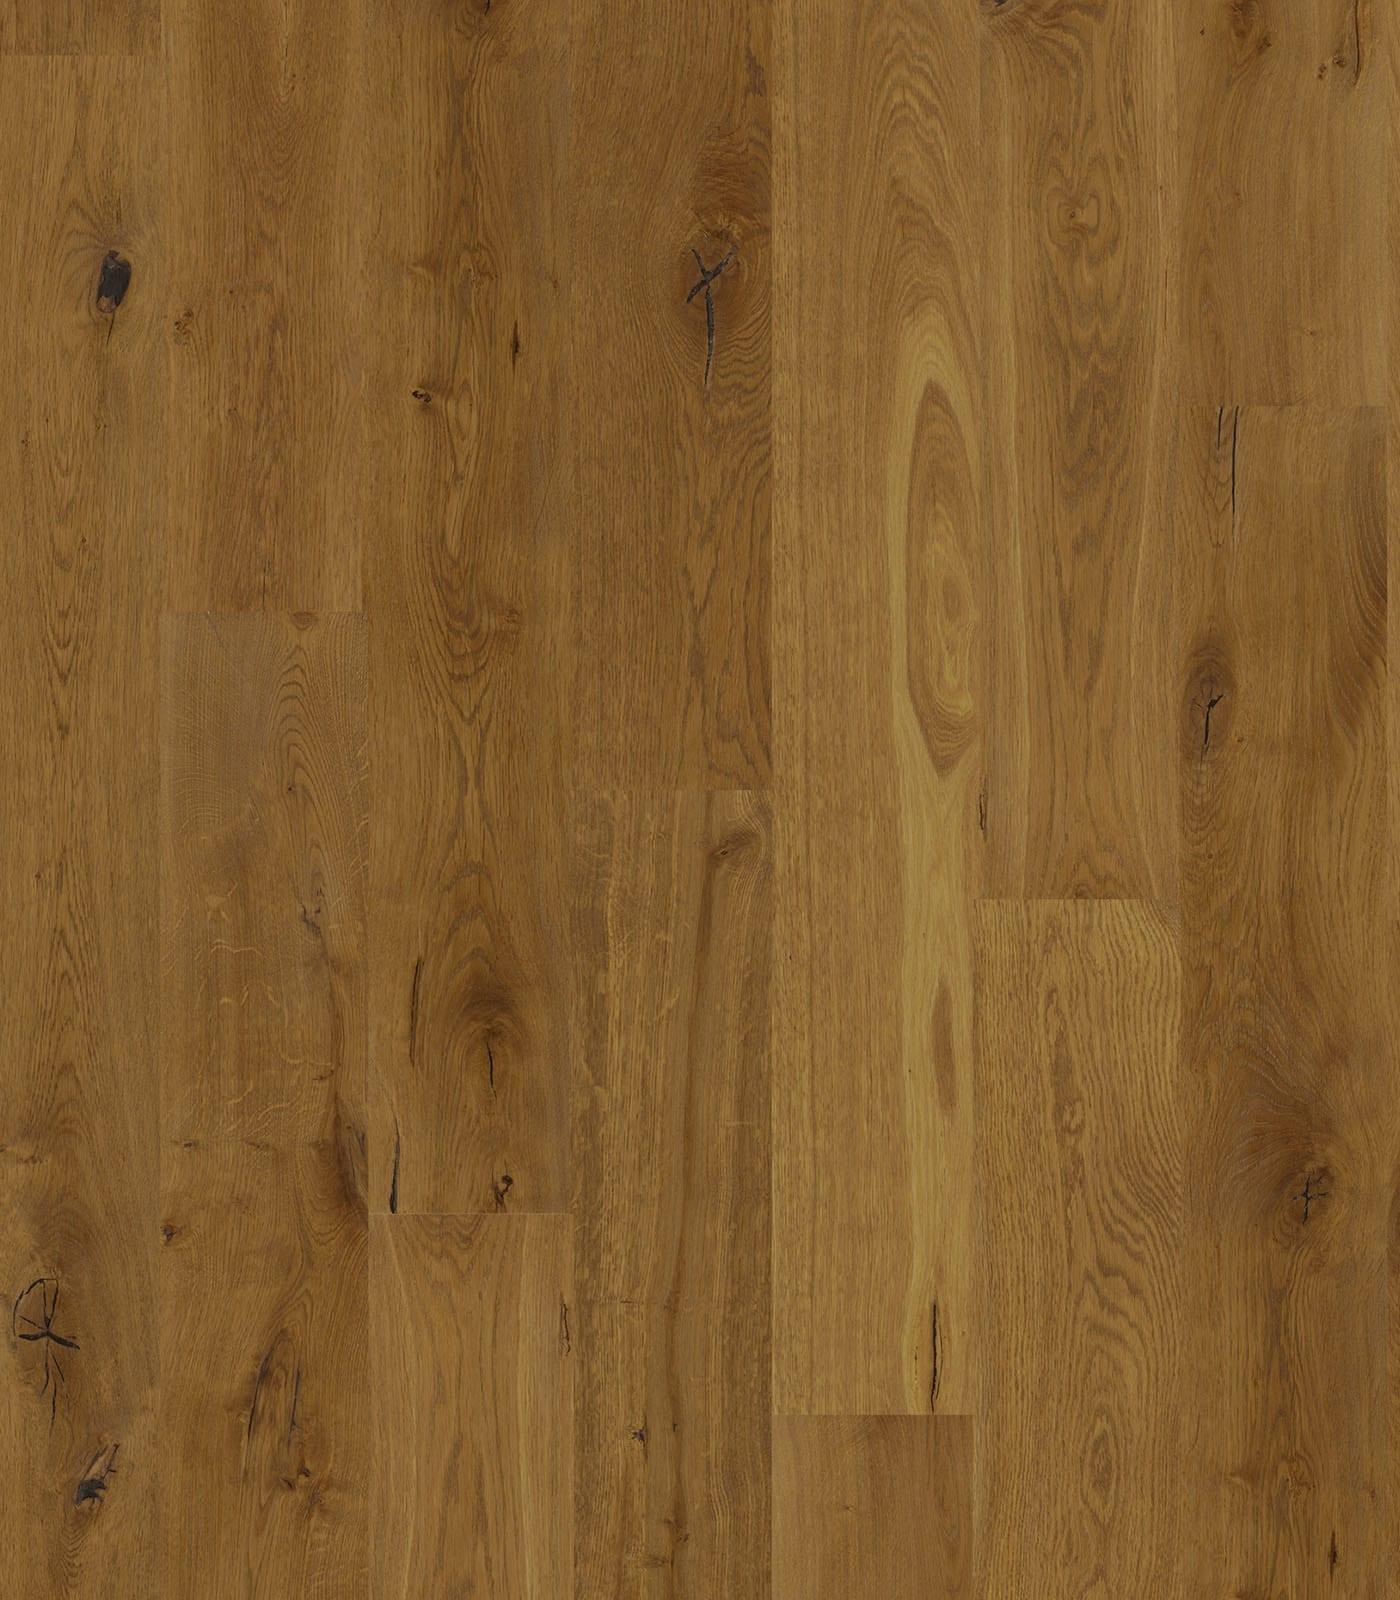 Sierra-Antique Collection-European Oak Floors-flat